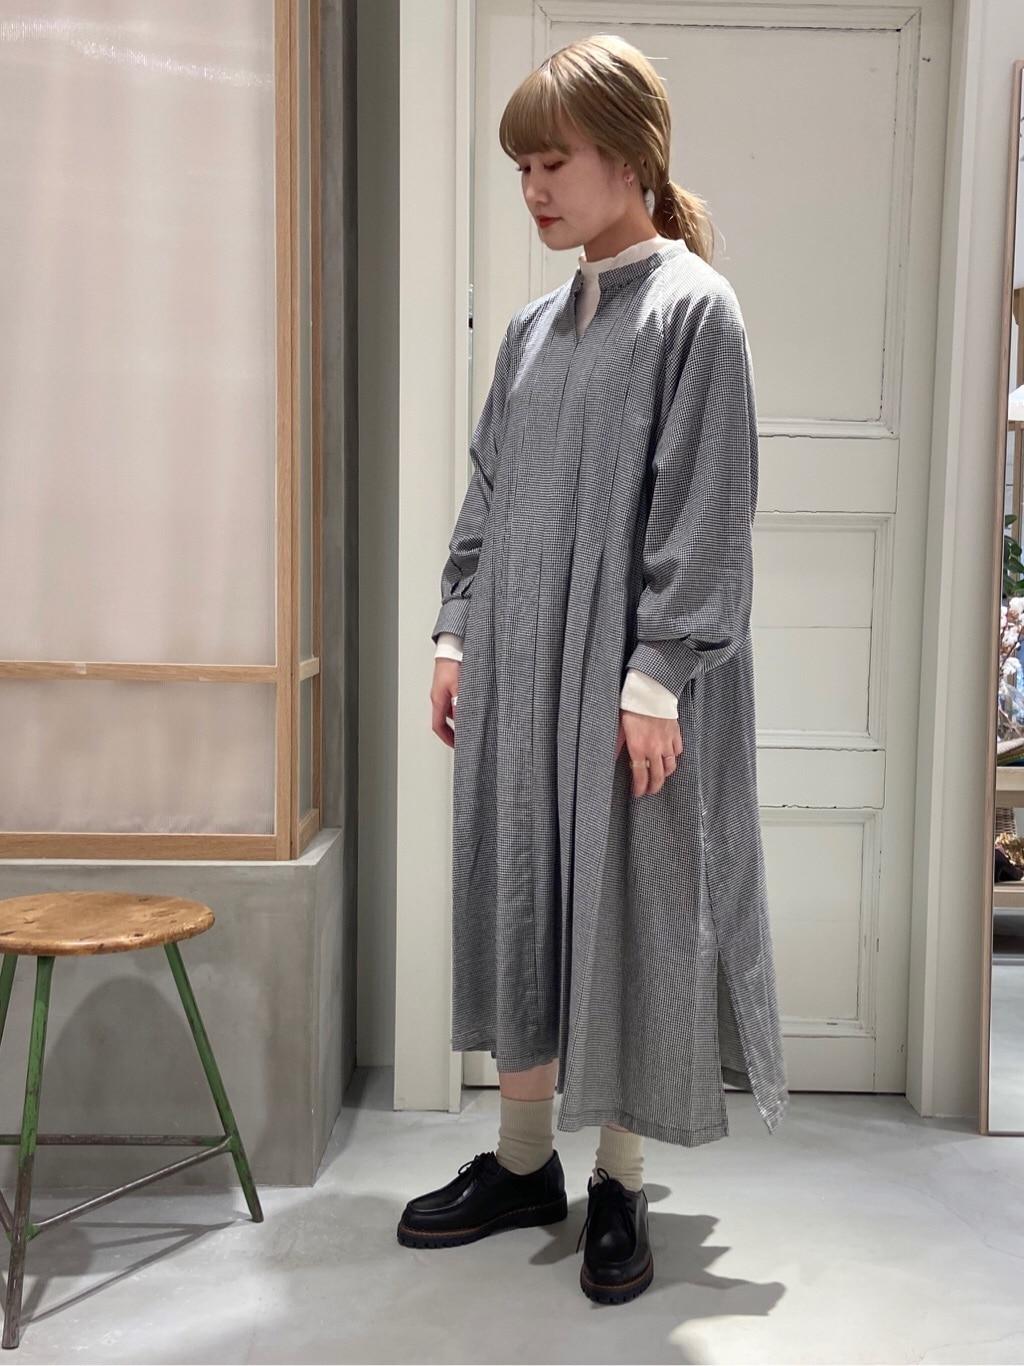 bulle de savon 渋谷スクランブルスクエア 身長:160cm 2020.10.19